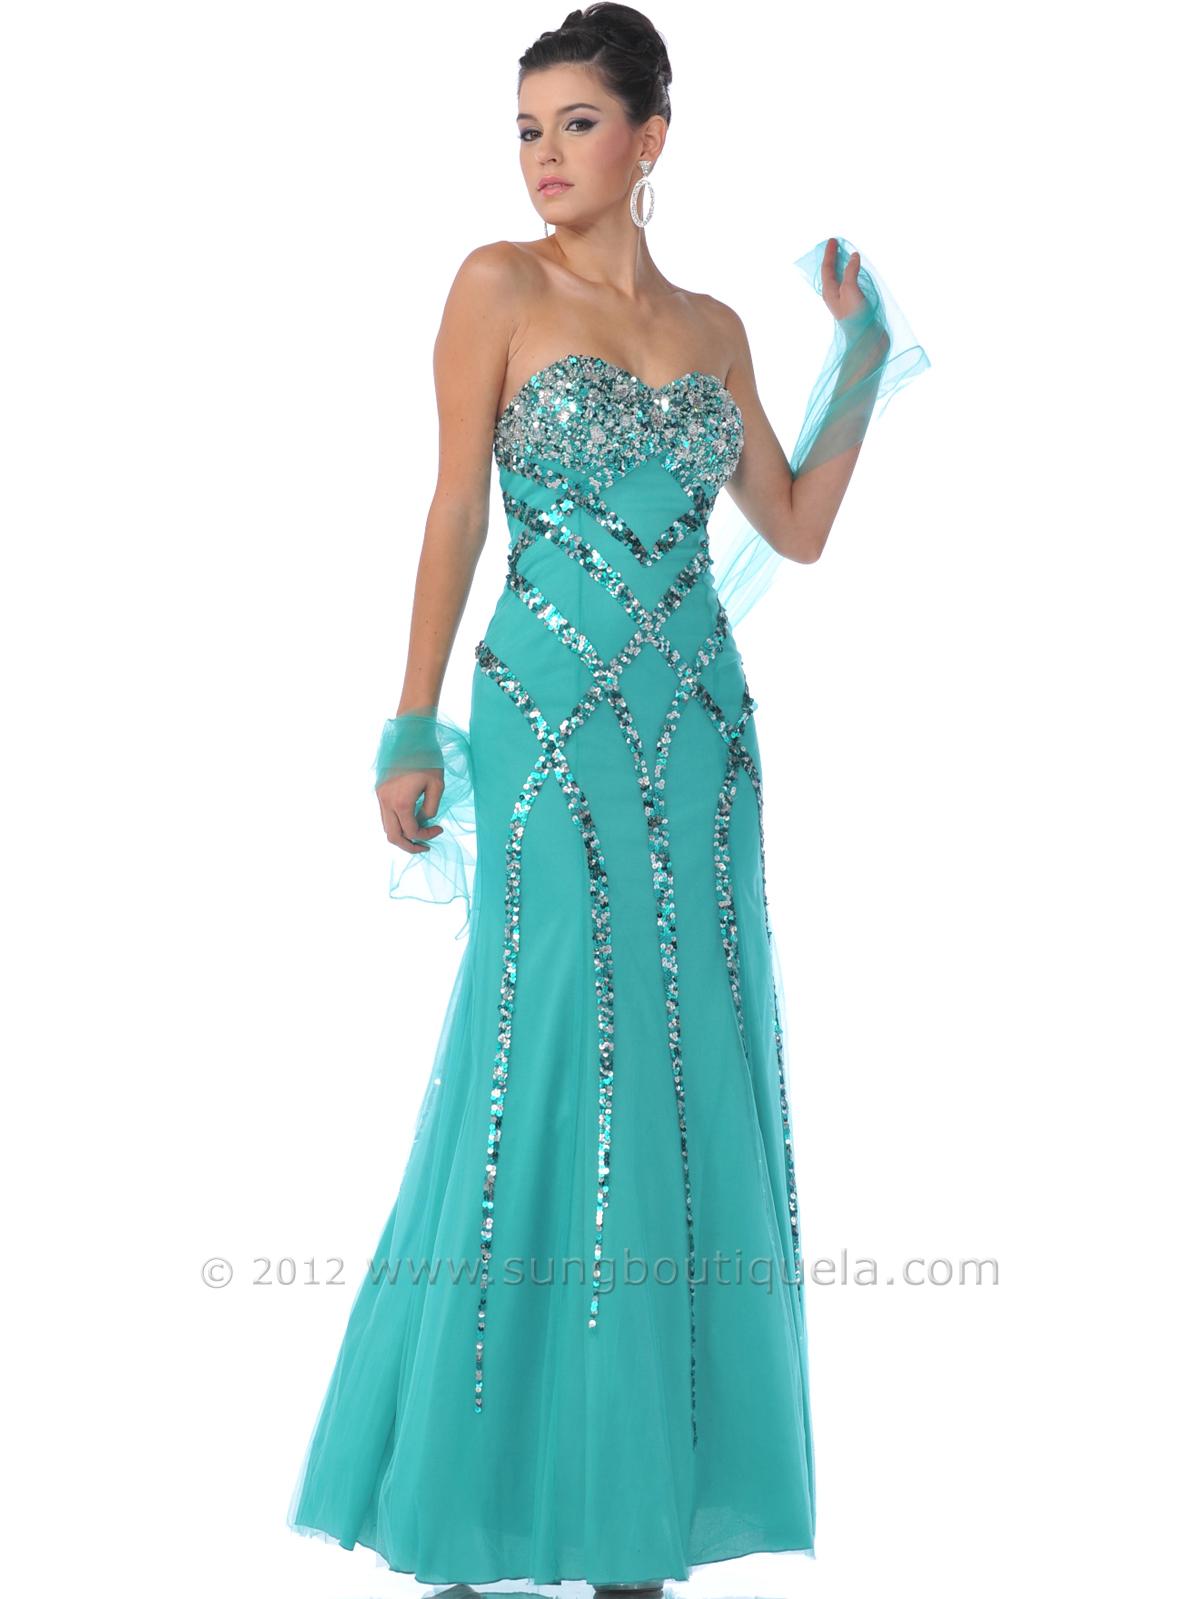 Jade Evening Dresses - Discount Evening Dresses